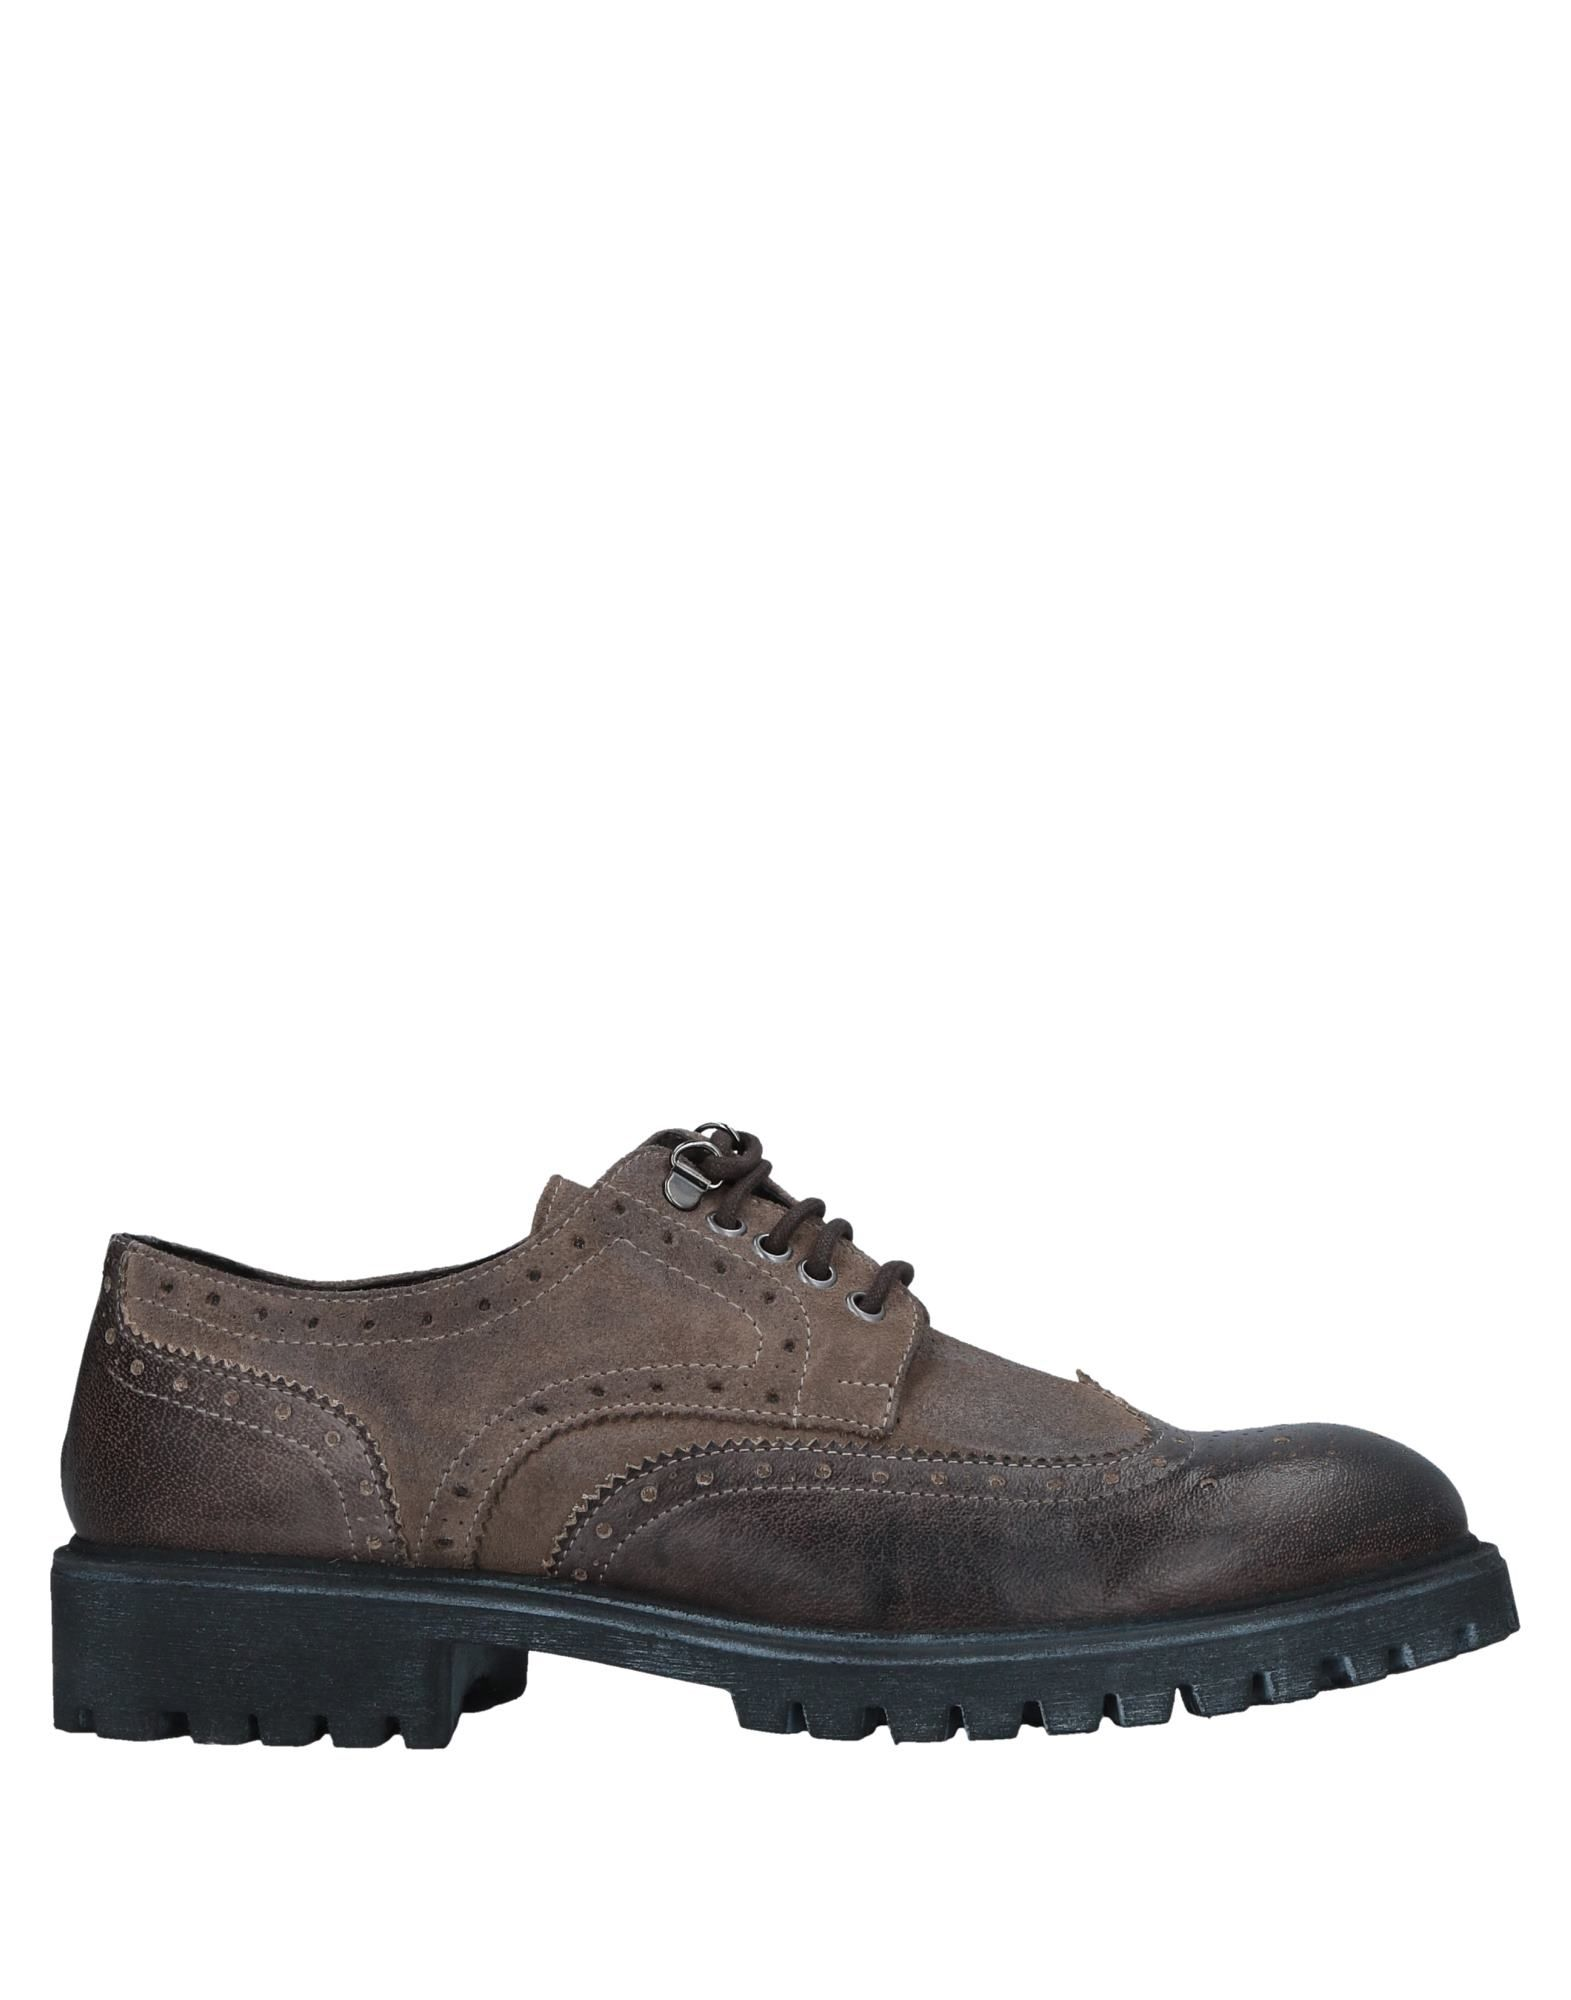 Rabatt echte Schuhe En Avance Schnürschuhe Herren  11532651UN